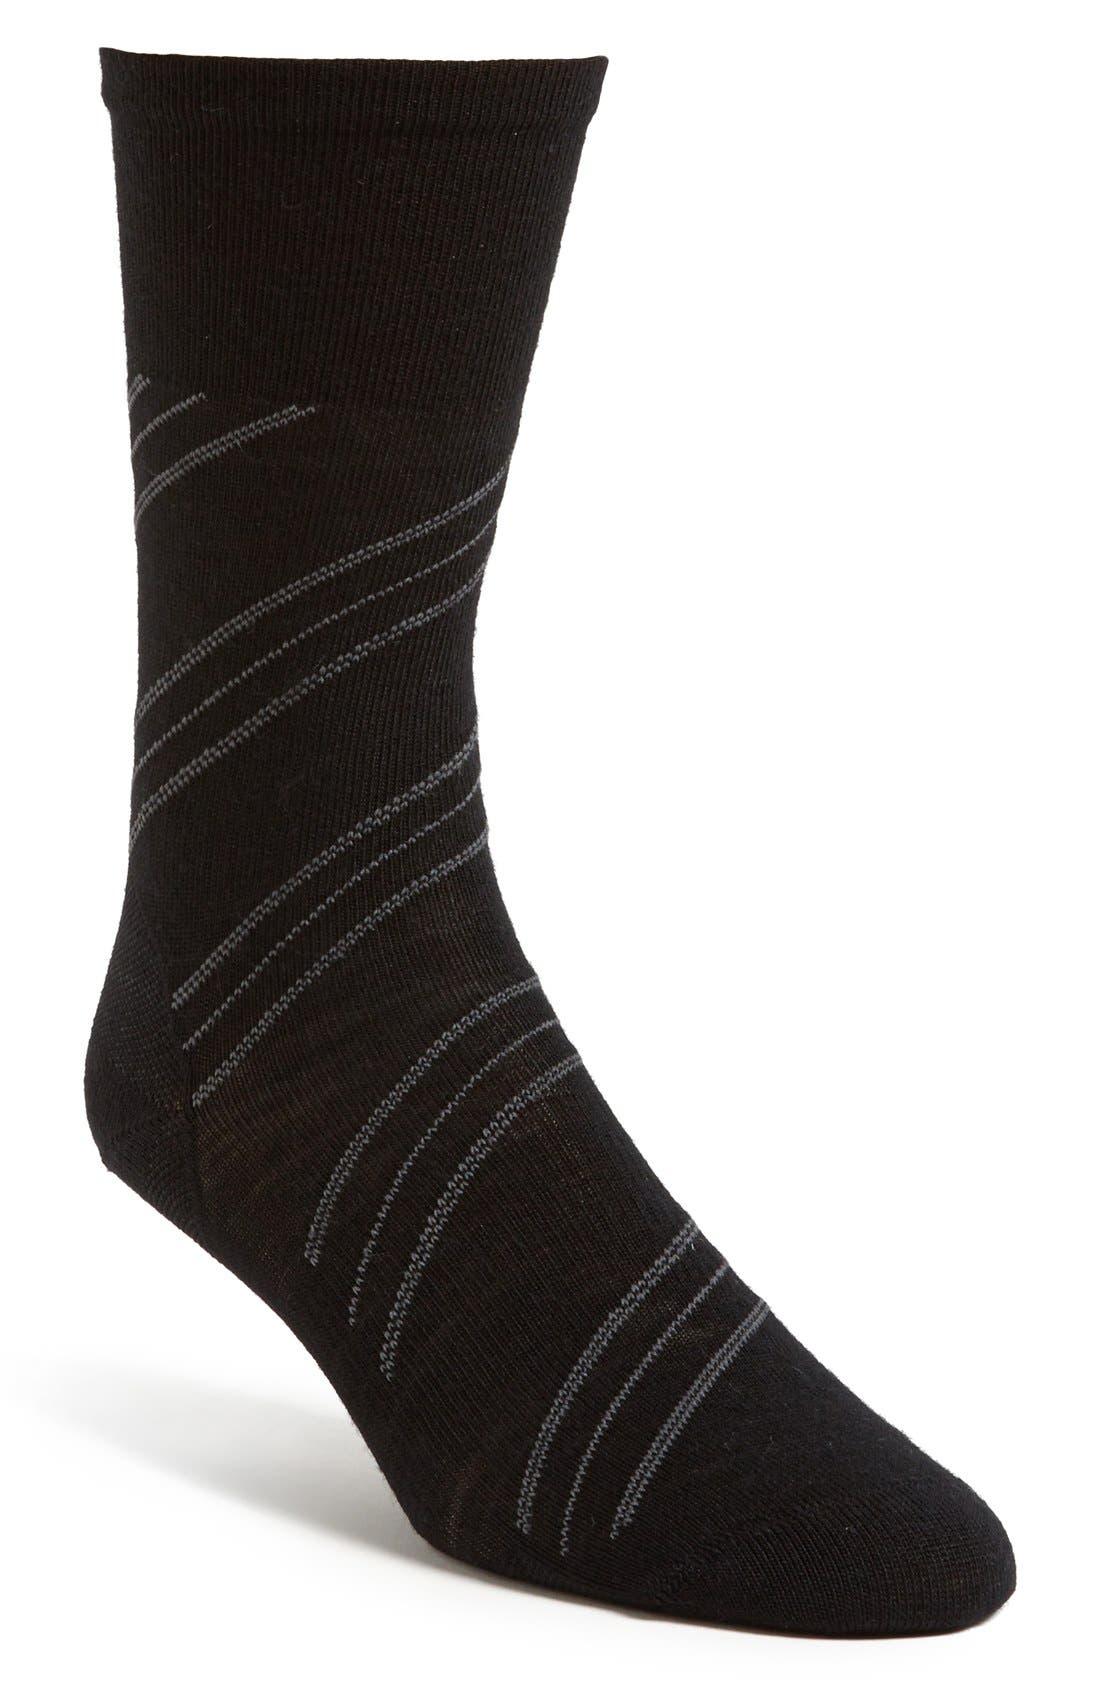 'Barber Pole' Socks, Main, color, 001